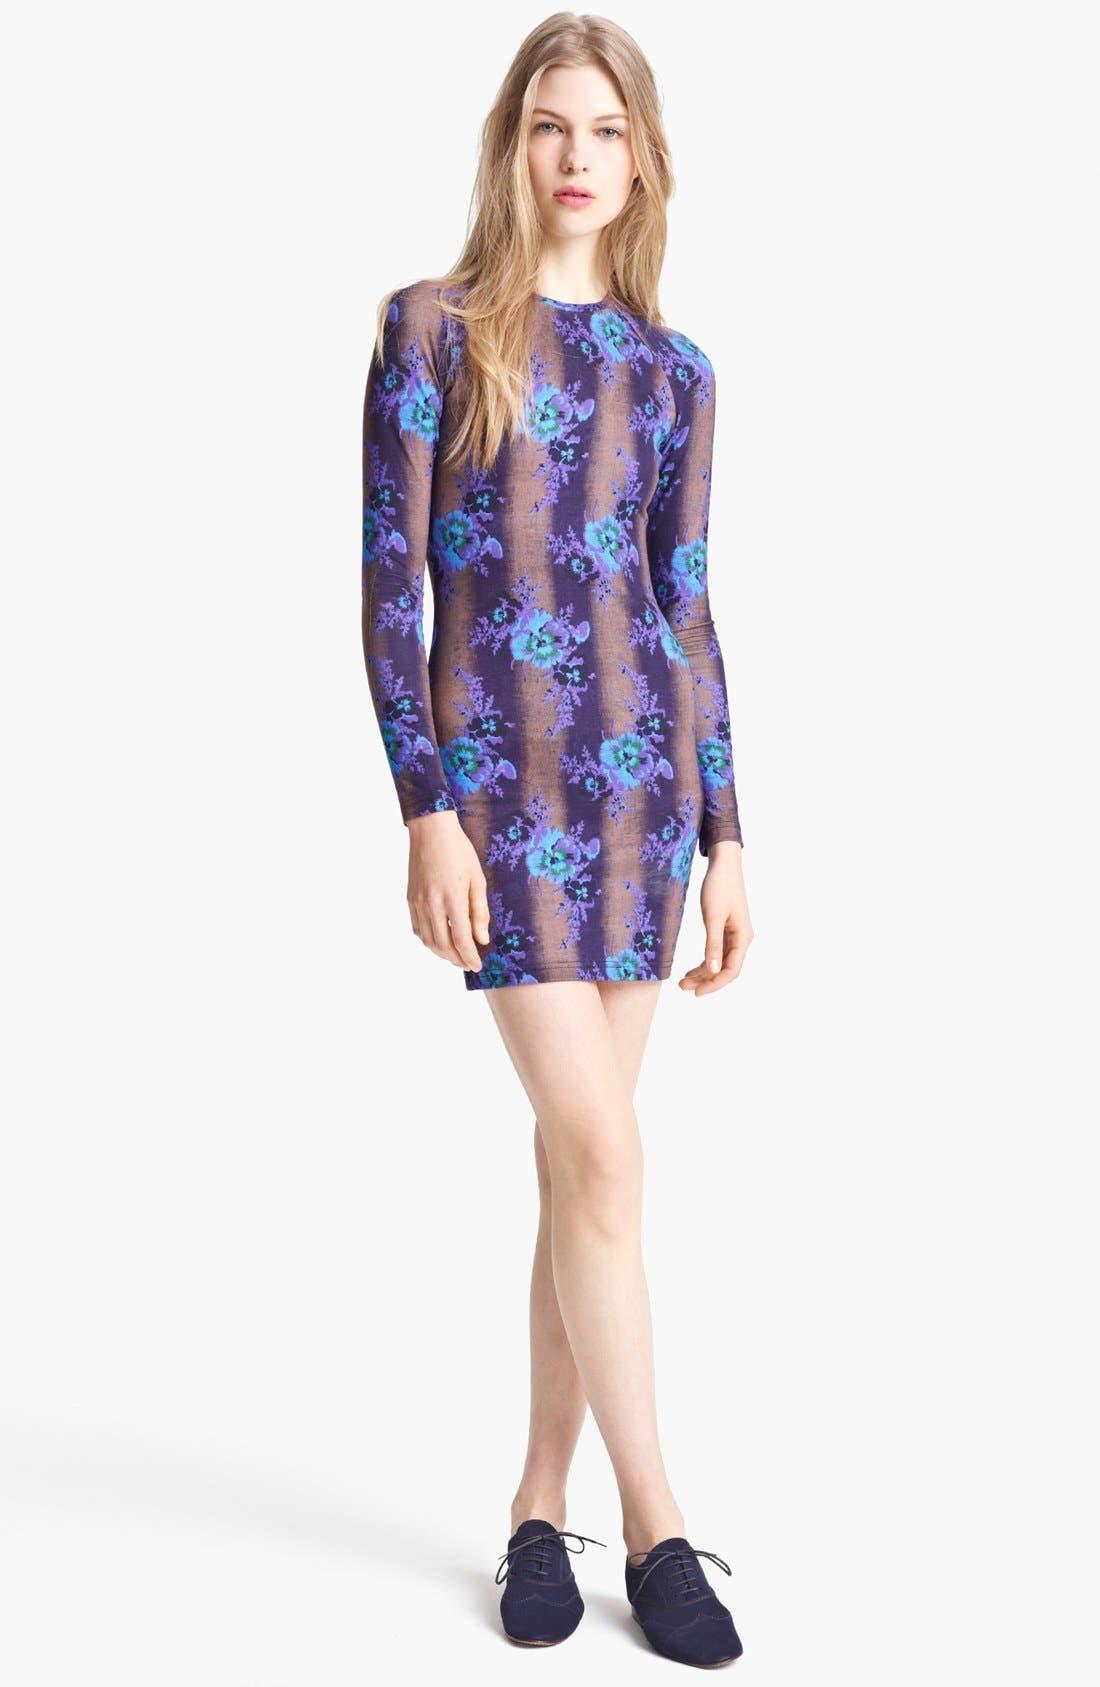 Alternate Image 1 Selected - Christopher Kane Bouquet Print Jersey Dress